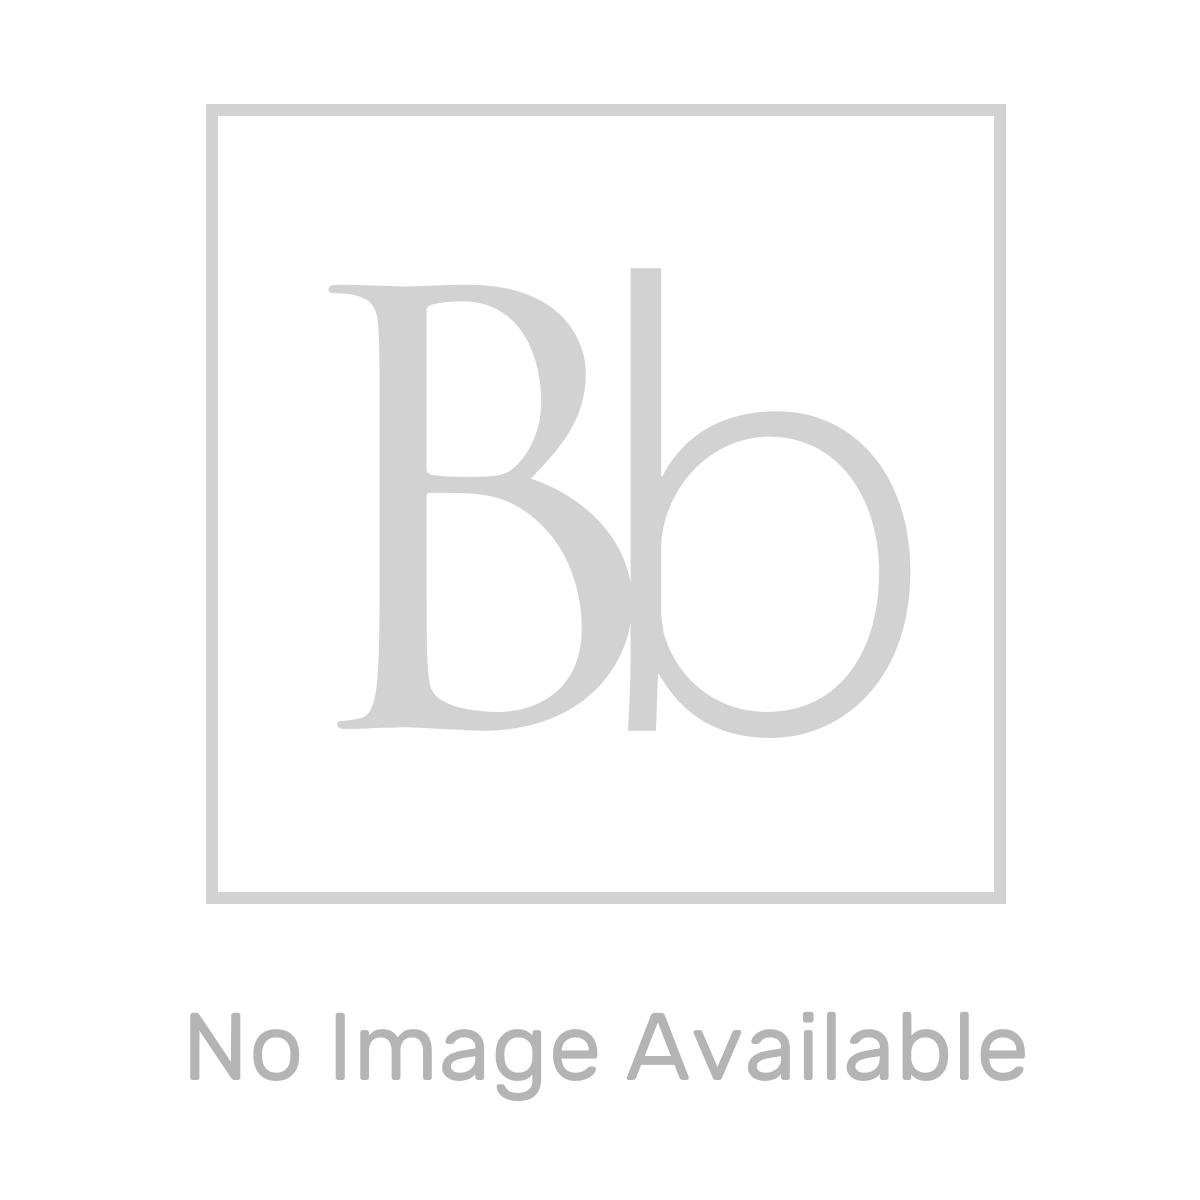 Sensio Beam Additional Mounting Bracket Set for Angled Aluminium Profile x 2